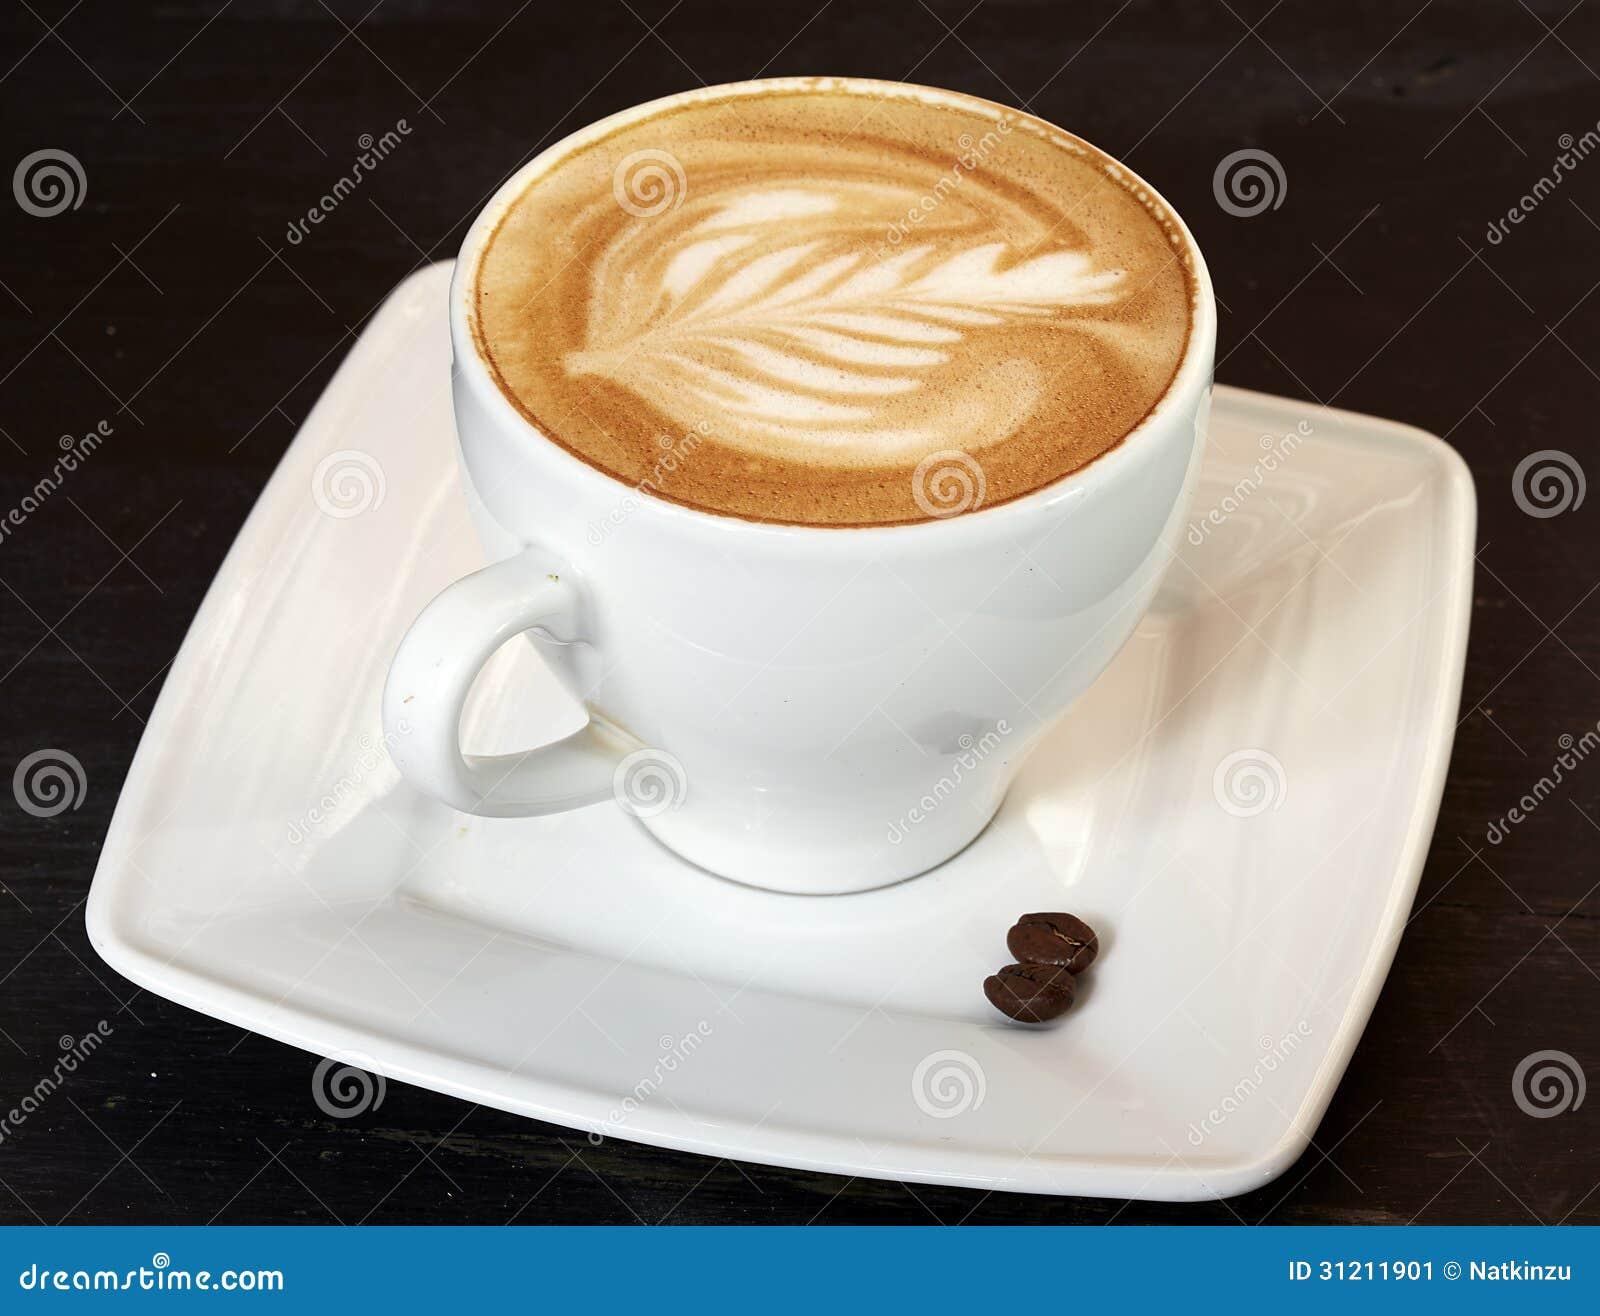 Taza de capuchino imagen de archivo imagen 31211901 for Taza de cafe con leche